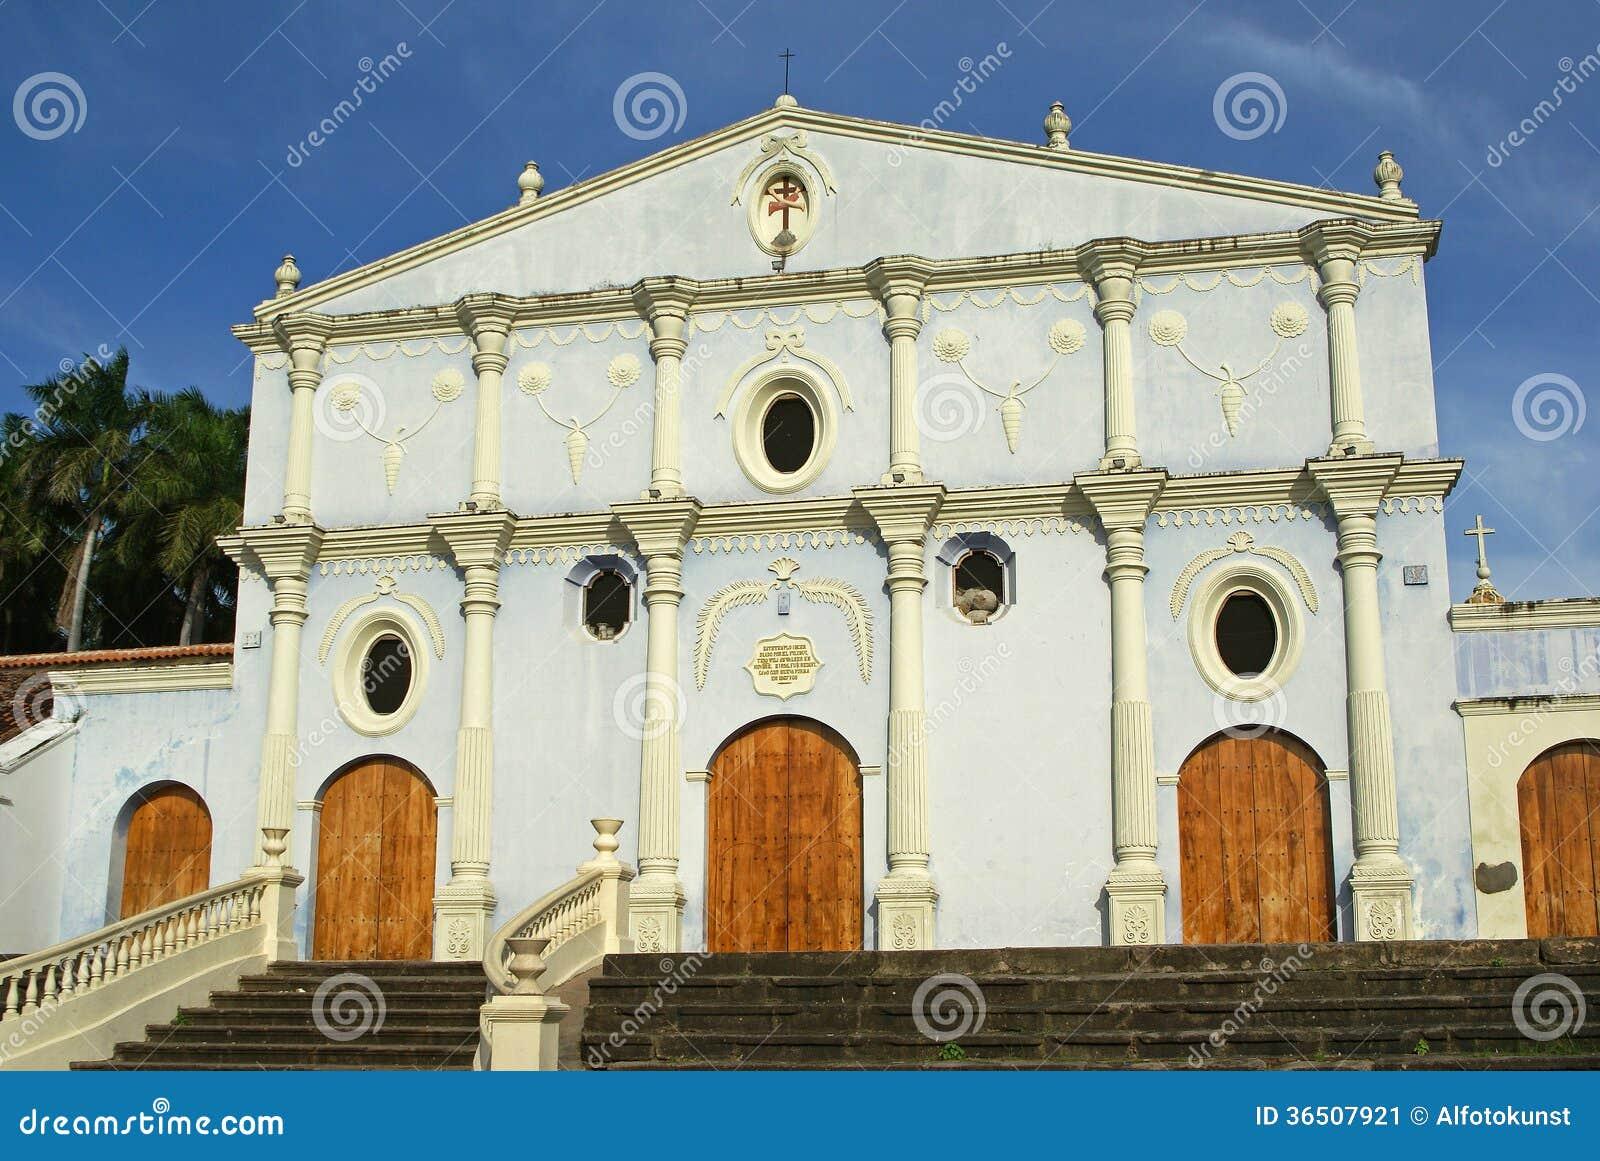 Église, Grenade, Nicaragua